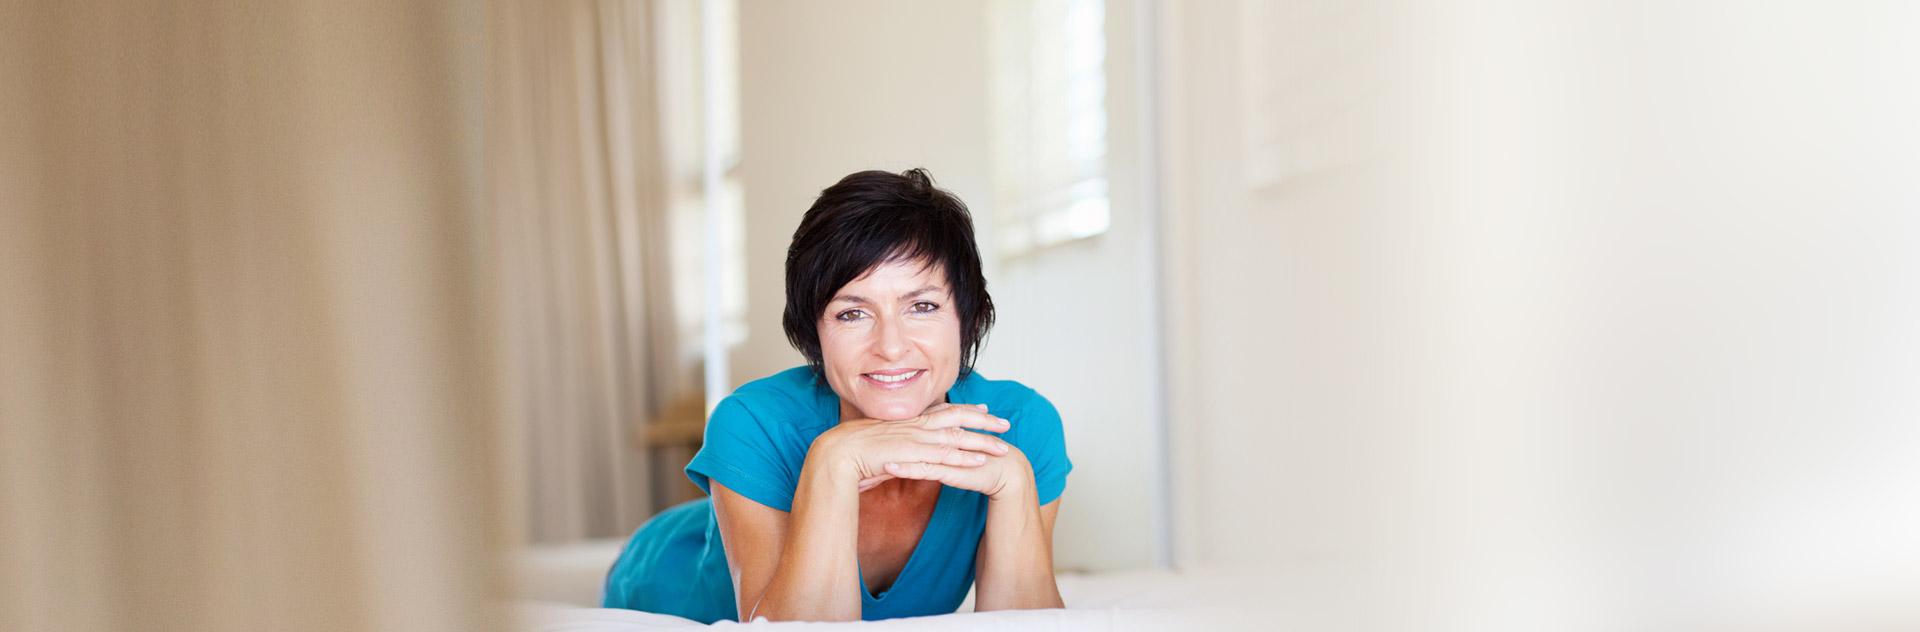 Mujer sonriendo tras optar por Pelucas Estéticas